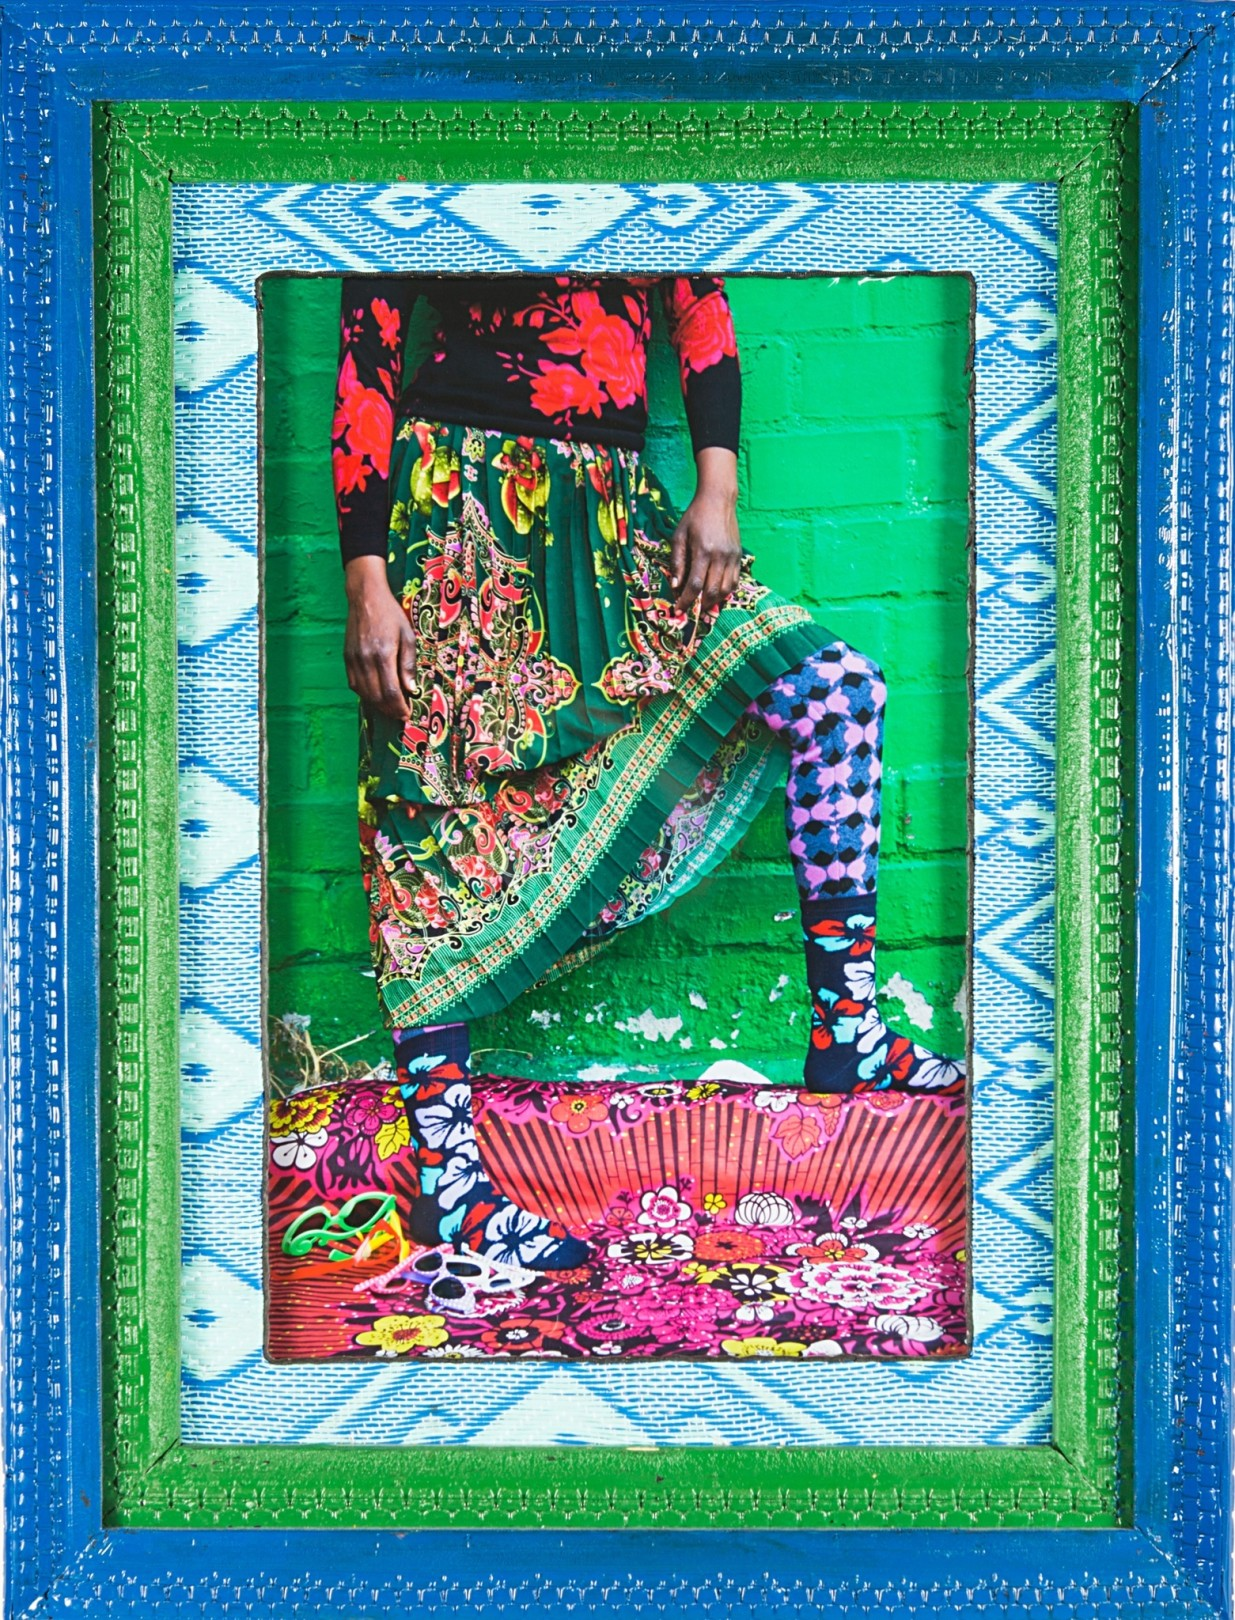 Hassan Hajjaj Wamuhu Legs, 2014/1435 Print: Metallic Lambda Print on 3mm Dibond Frame: Wood, tyre, plastic mat & perspex Frame: 41.34h x 31.5w in (105h x 80w cm) Print: 29.53h x 19.69w in (75h x 50w cm) edition of 5 plus 2 artist's proofs